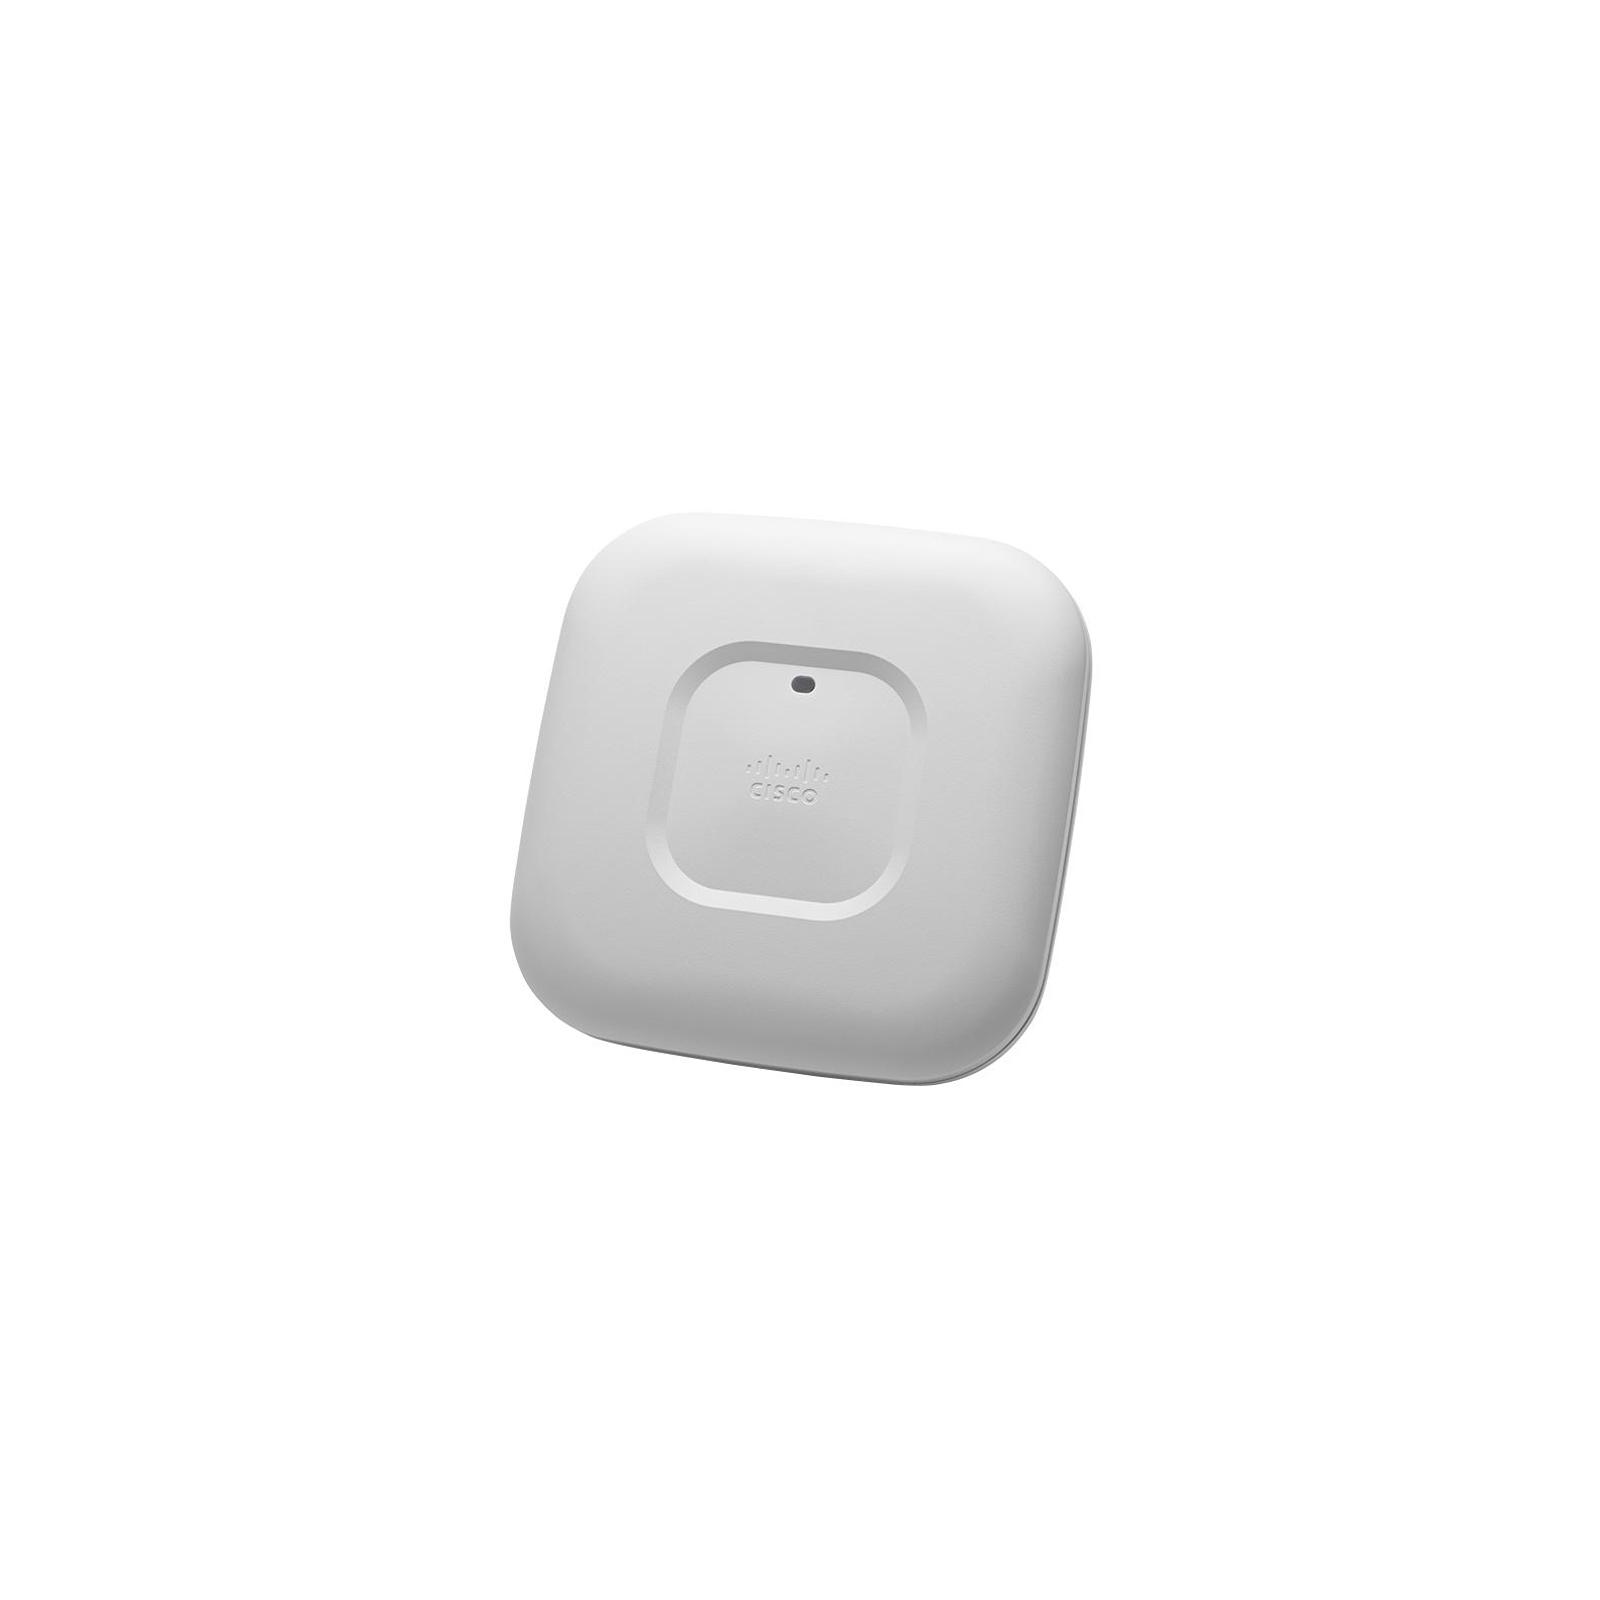 Точка доступа Wi-Fi Cisco AIR-CAP2702E-E (AIR-CAP2702E-E-K9) изображение 3